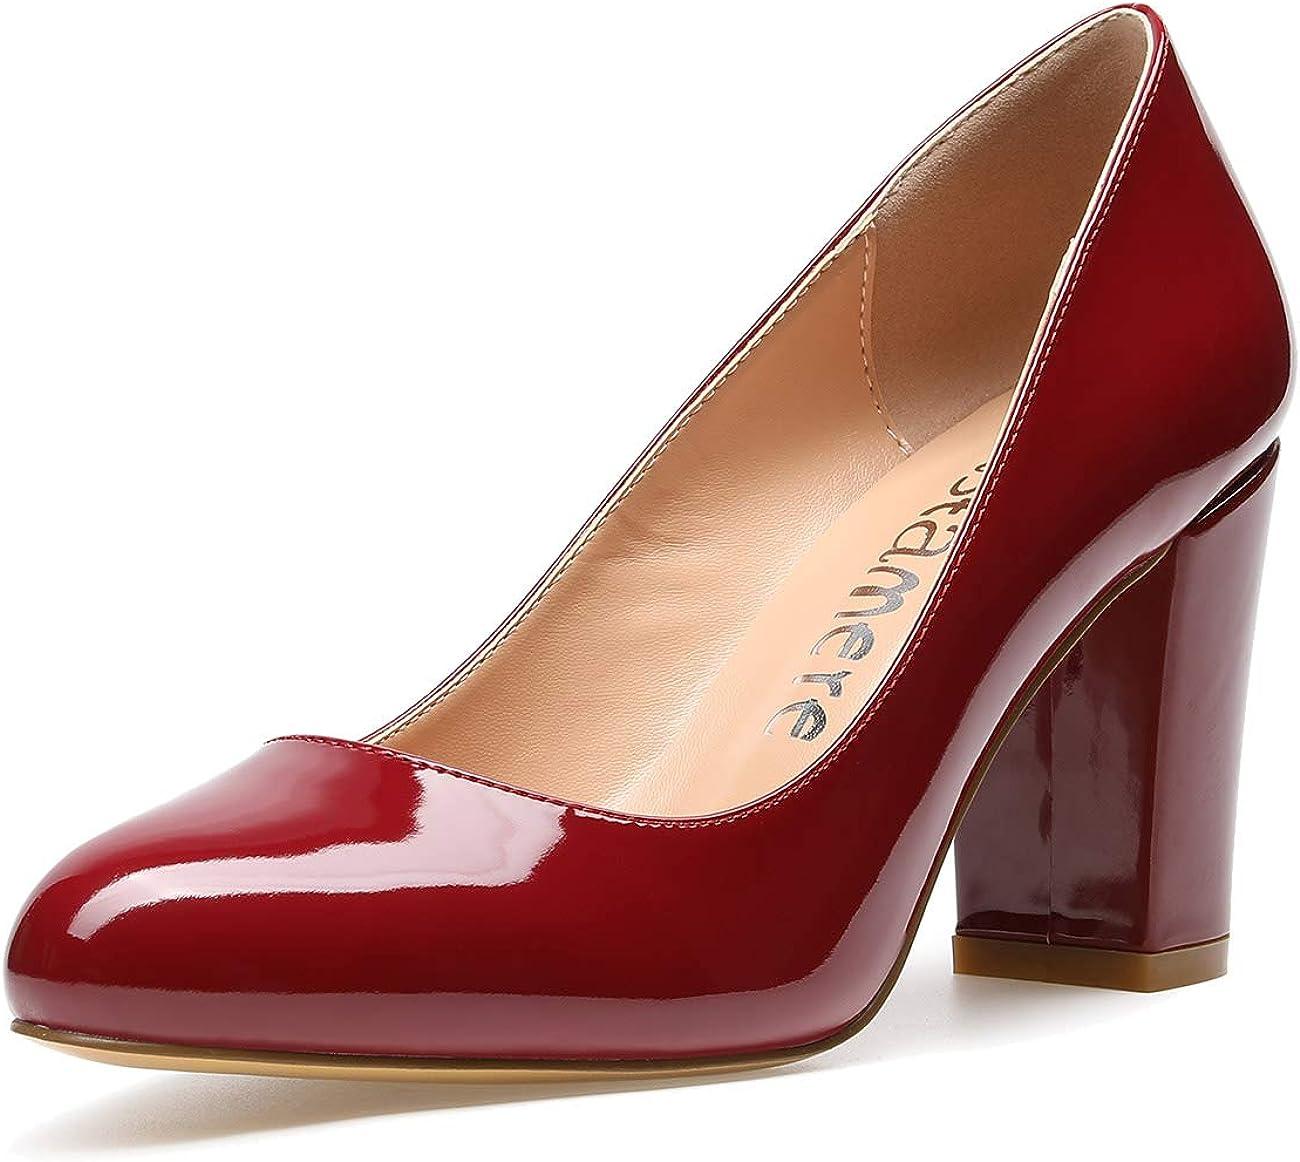 Castamere Women's High Heels Round Block Direct sale Mesa Mall of manufacturer Pumps Toe Slip-On Heel